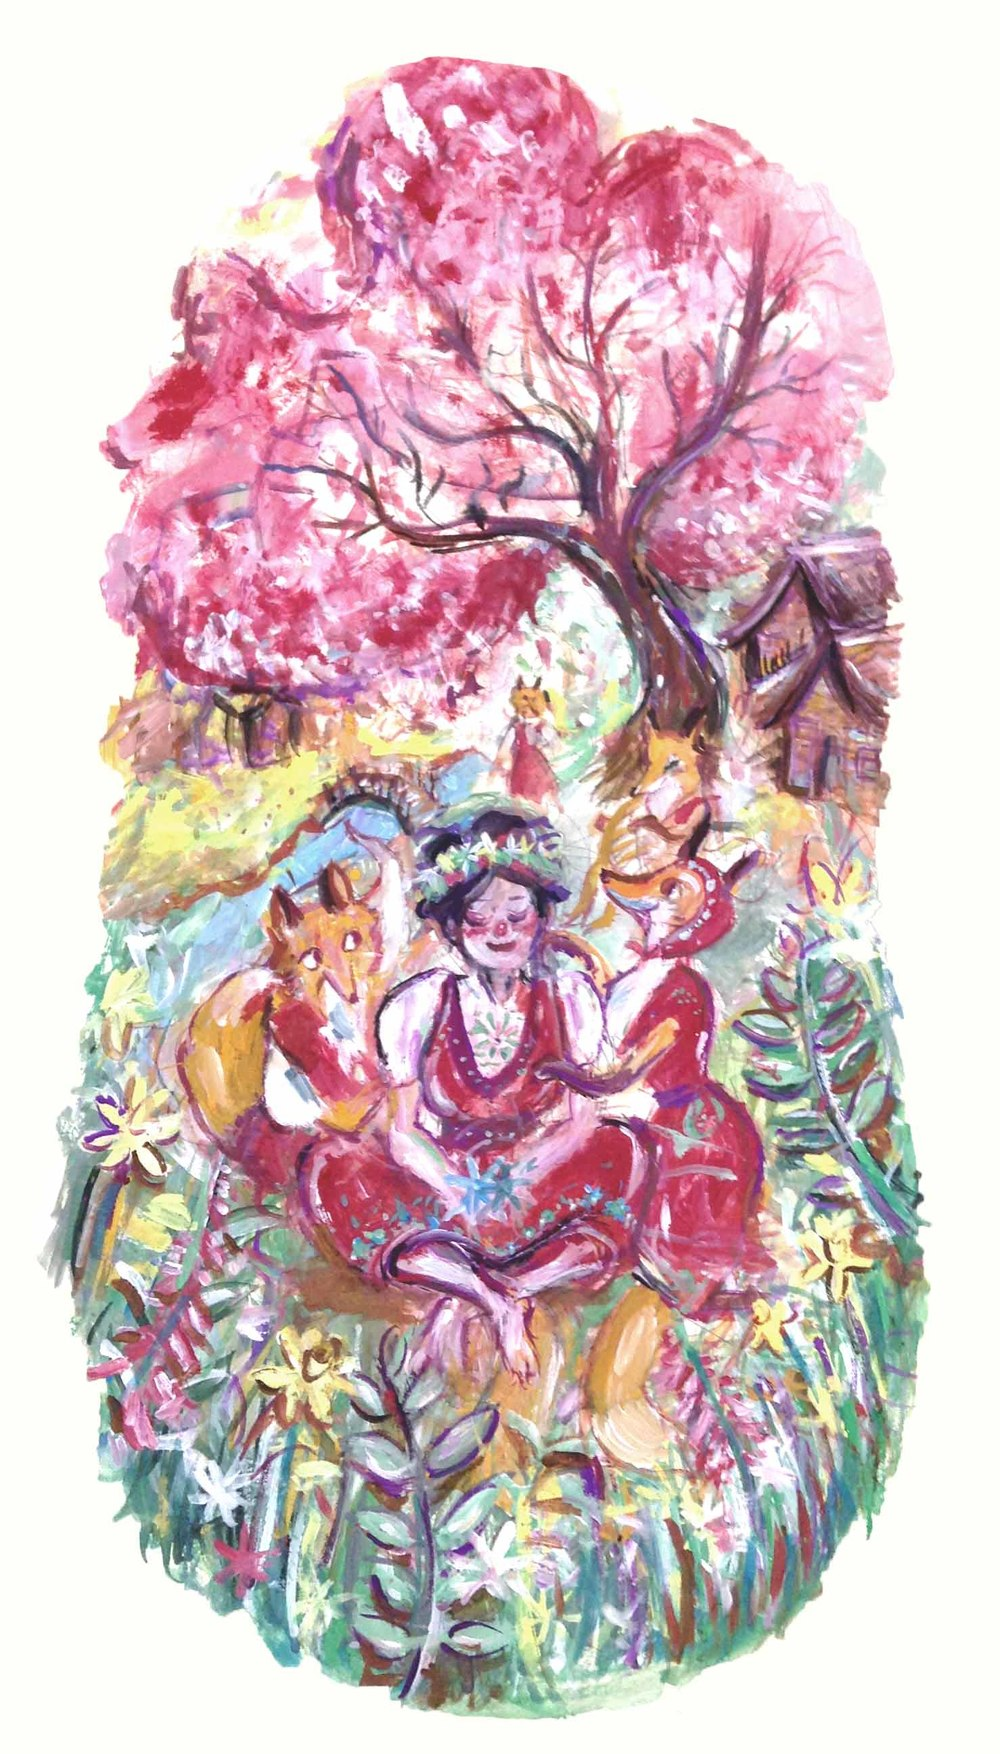 Illustration based off of Margaret Cavendish's 'The Blazing World'.